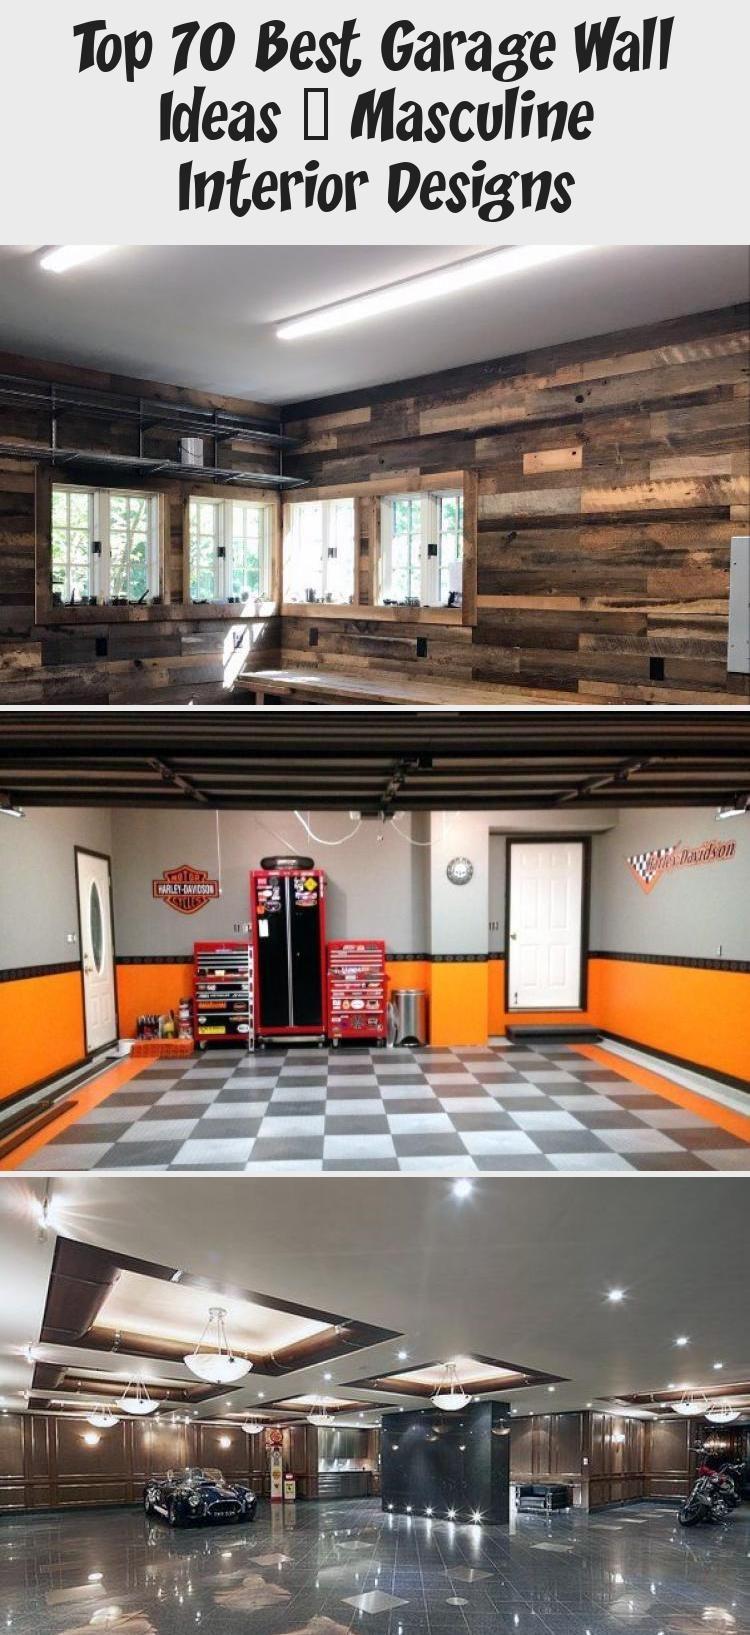 Rusted Steel With Natural Wood Planks Garage Wall Interior Design Interiordesignpos In 2020 Masculine Interior Design Wallpaper Interior Design Unique Interior Design